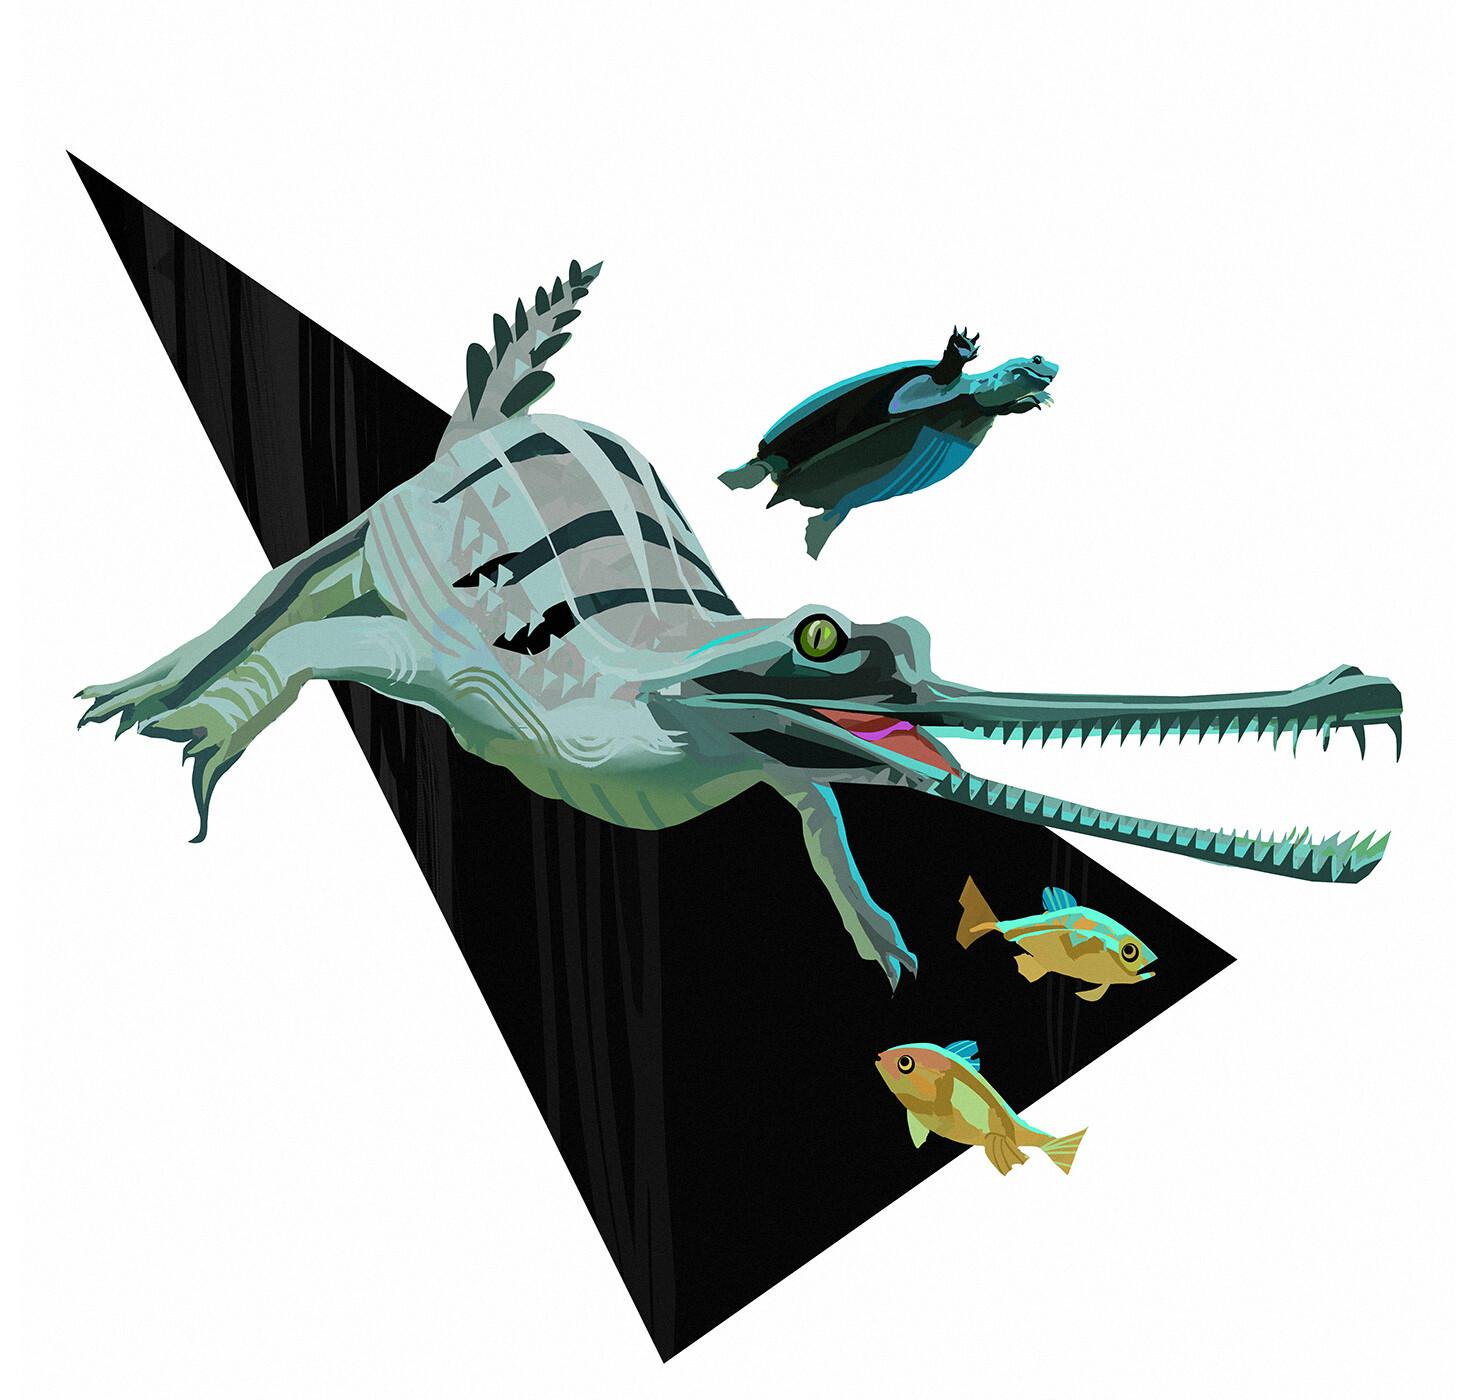 Hugo puzzuoli gharial small